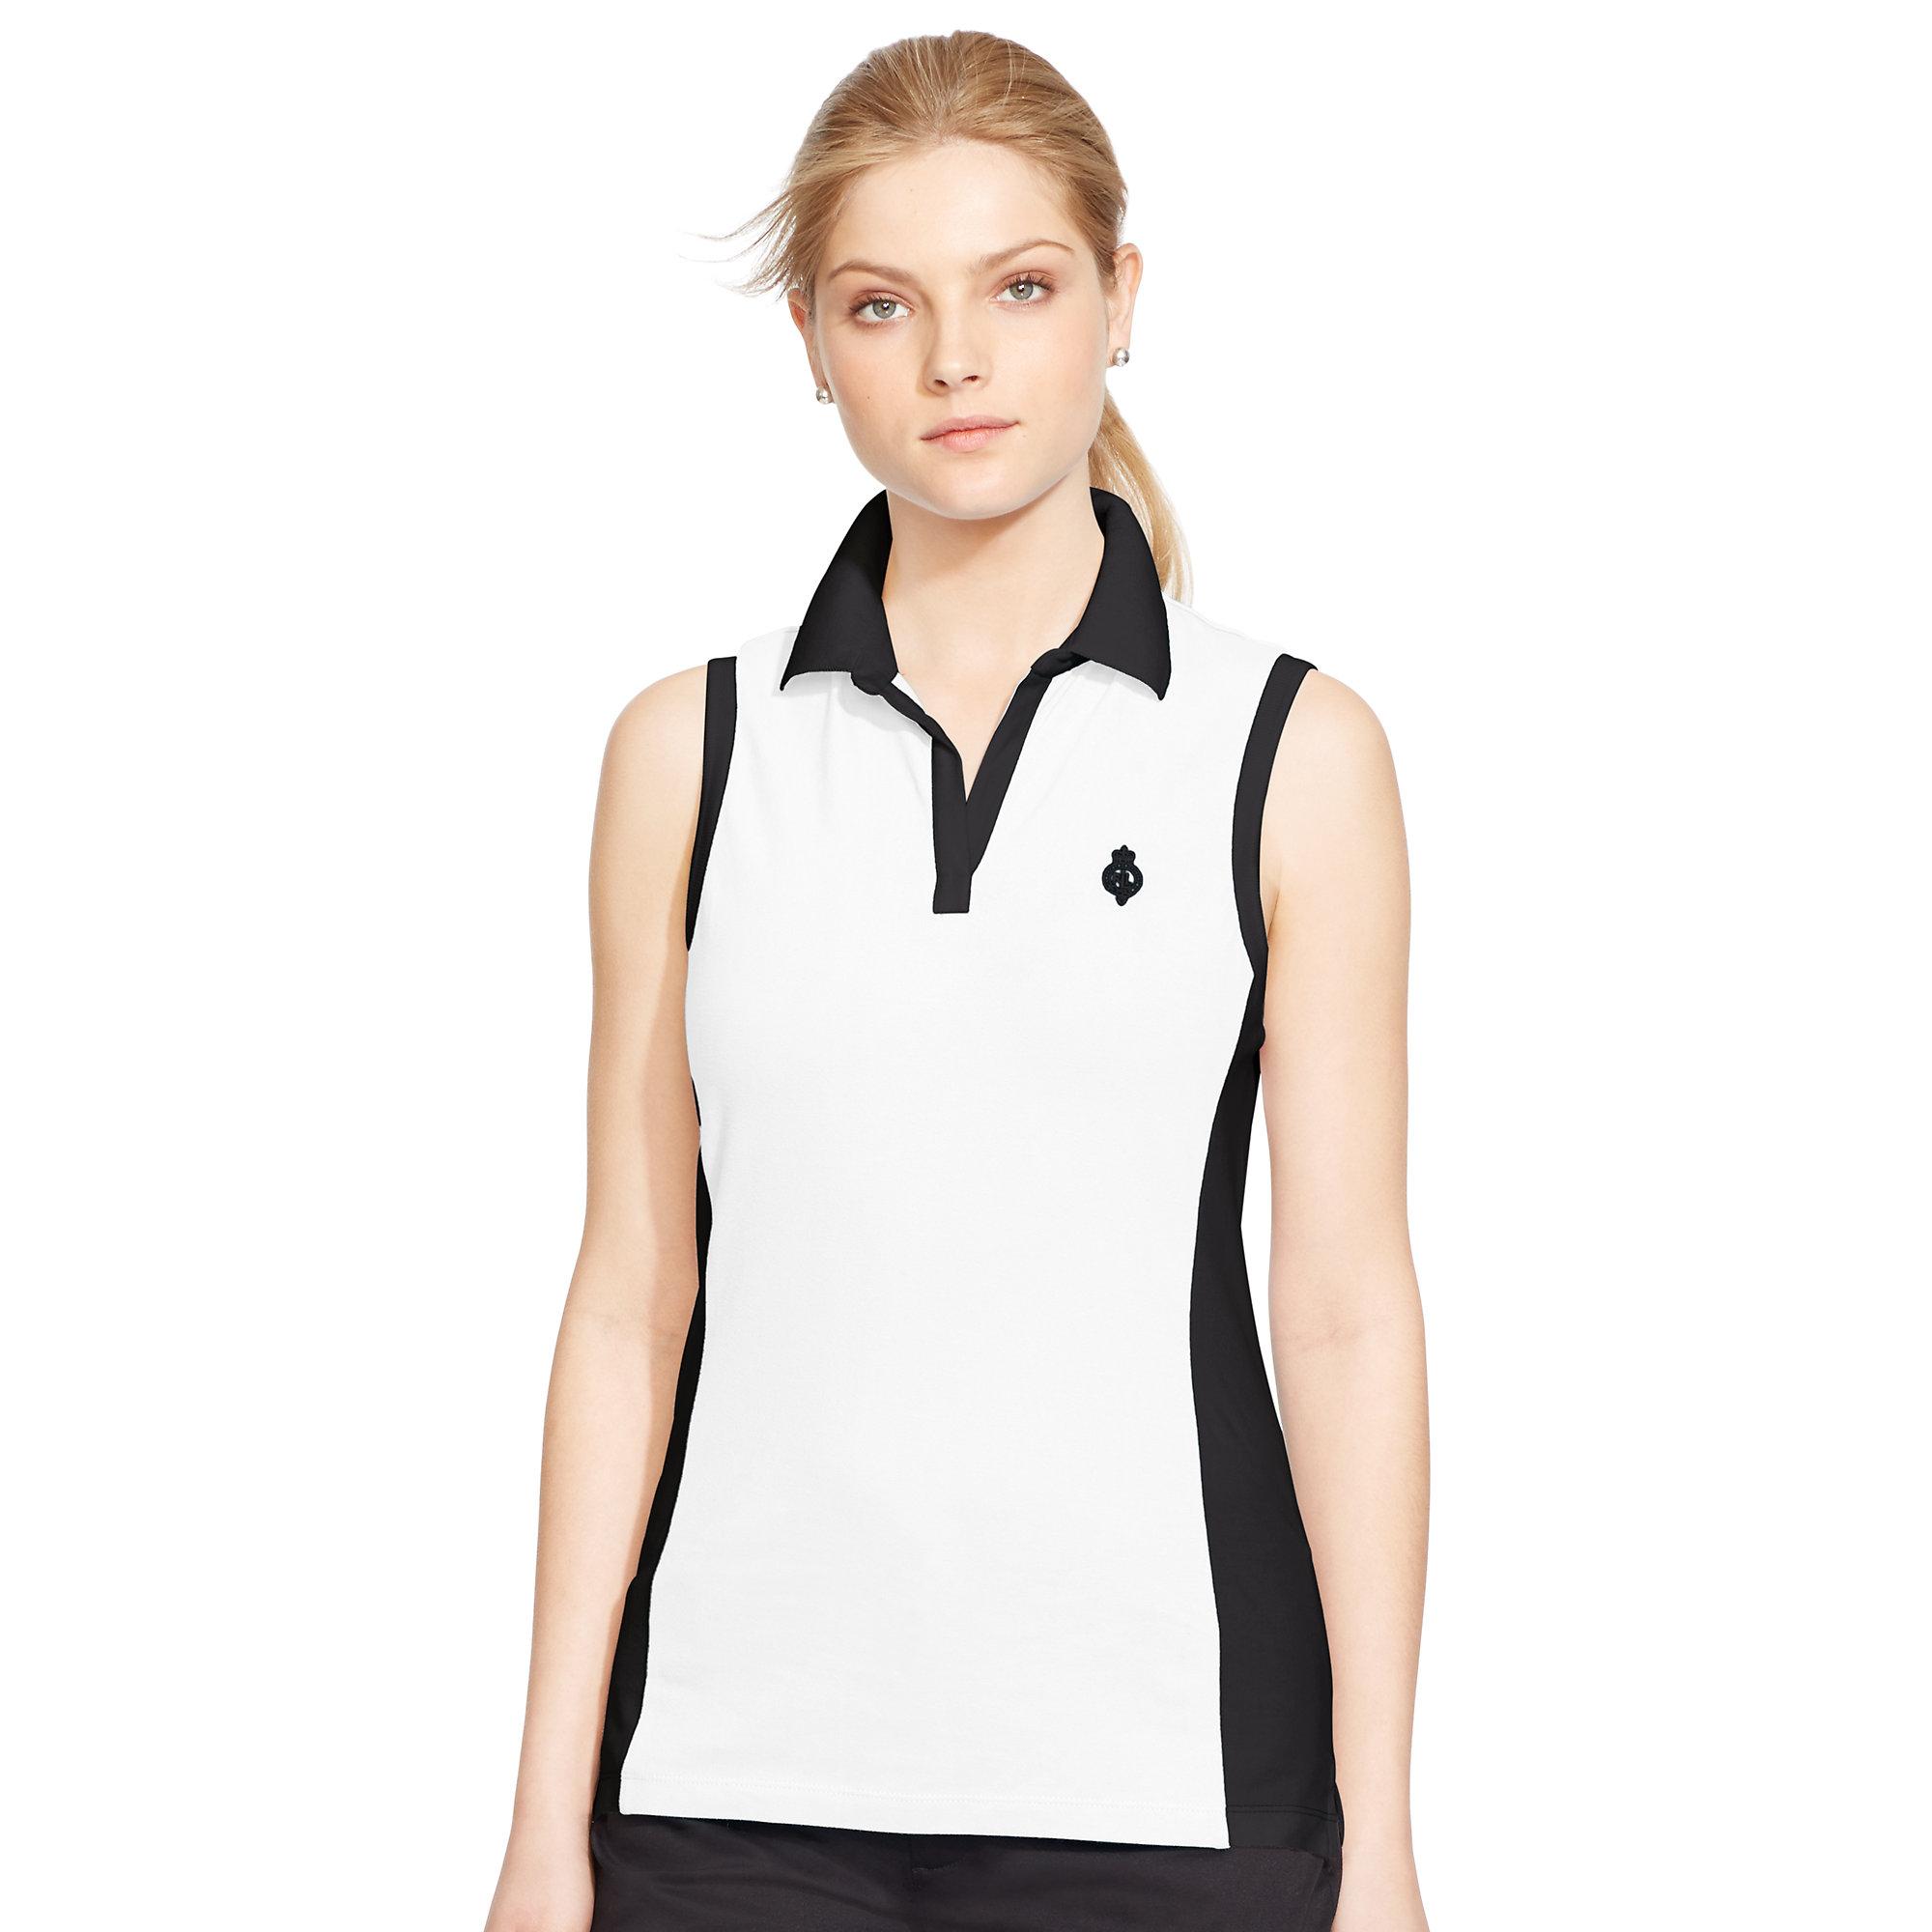 Lyst ralph lauren cotton sleeveless polo shirt in black for Black sleeveless shirt womens